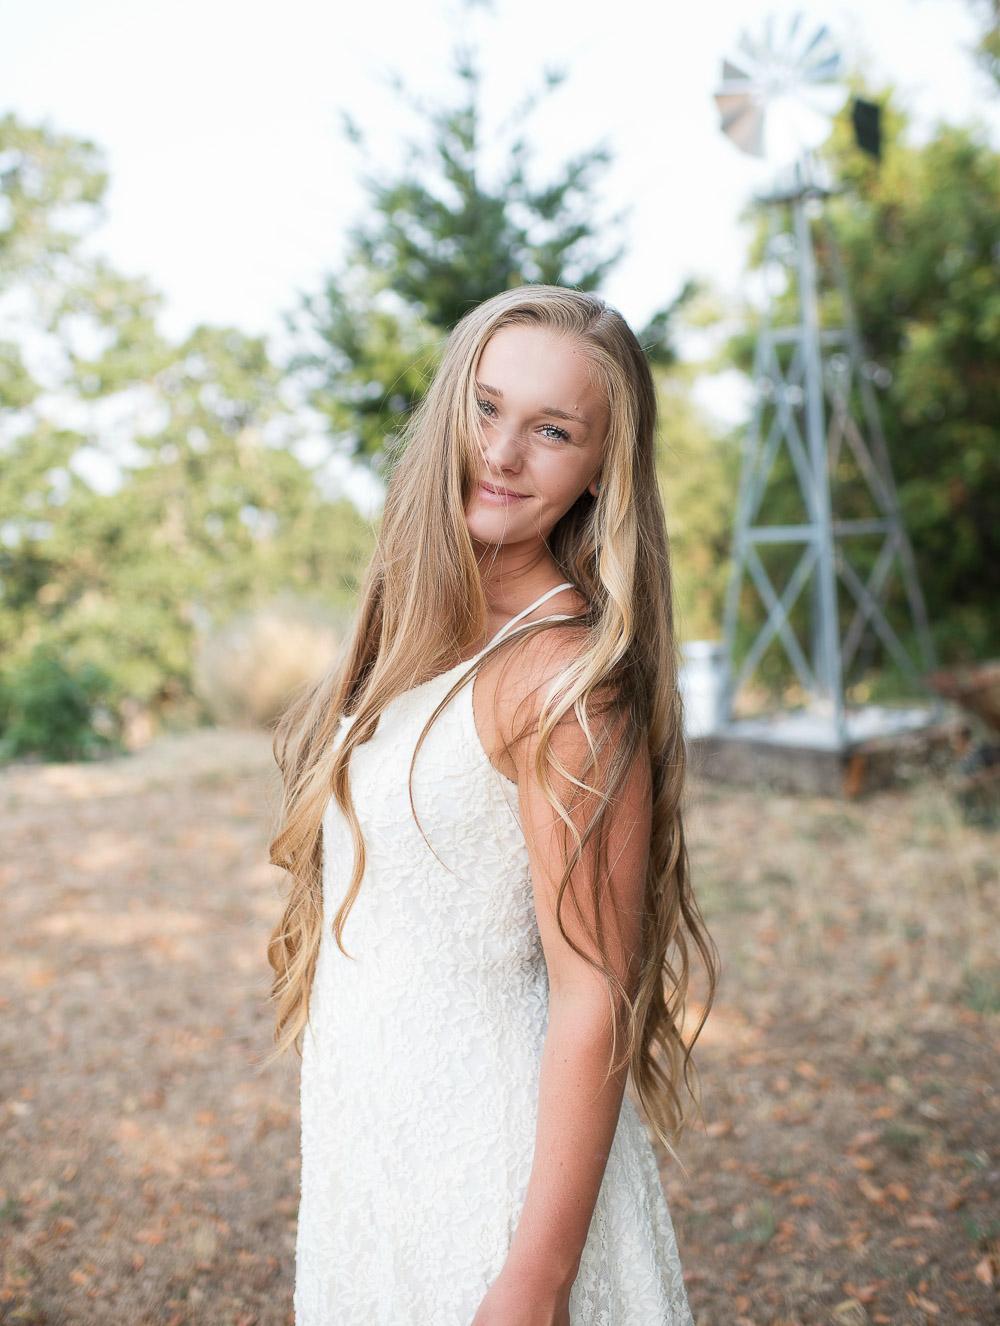 Emily-SeniorPortraits-HumboldtCounty-Parky'sPics-Horse-30.jpg